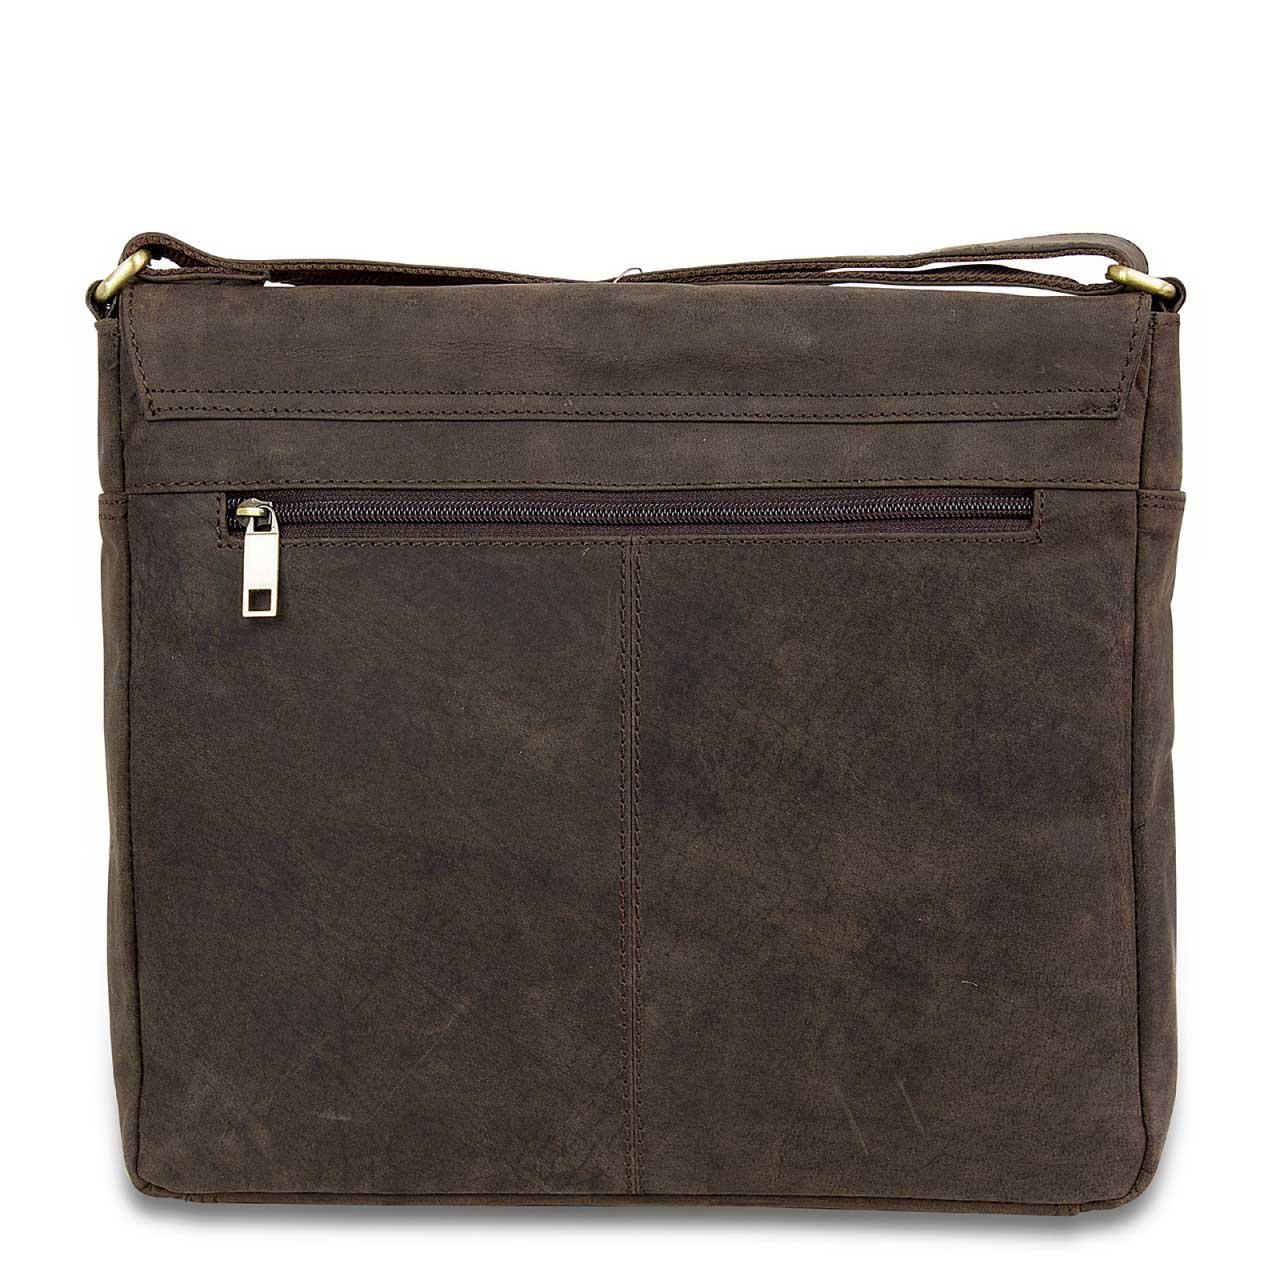 STILORD Leder Messenger Bag kompakt Vintage Schulter Umhängetasche 12.2 Zoll Tablets MacBook Tasche echtes Leder dunkelbraun - Bild 8